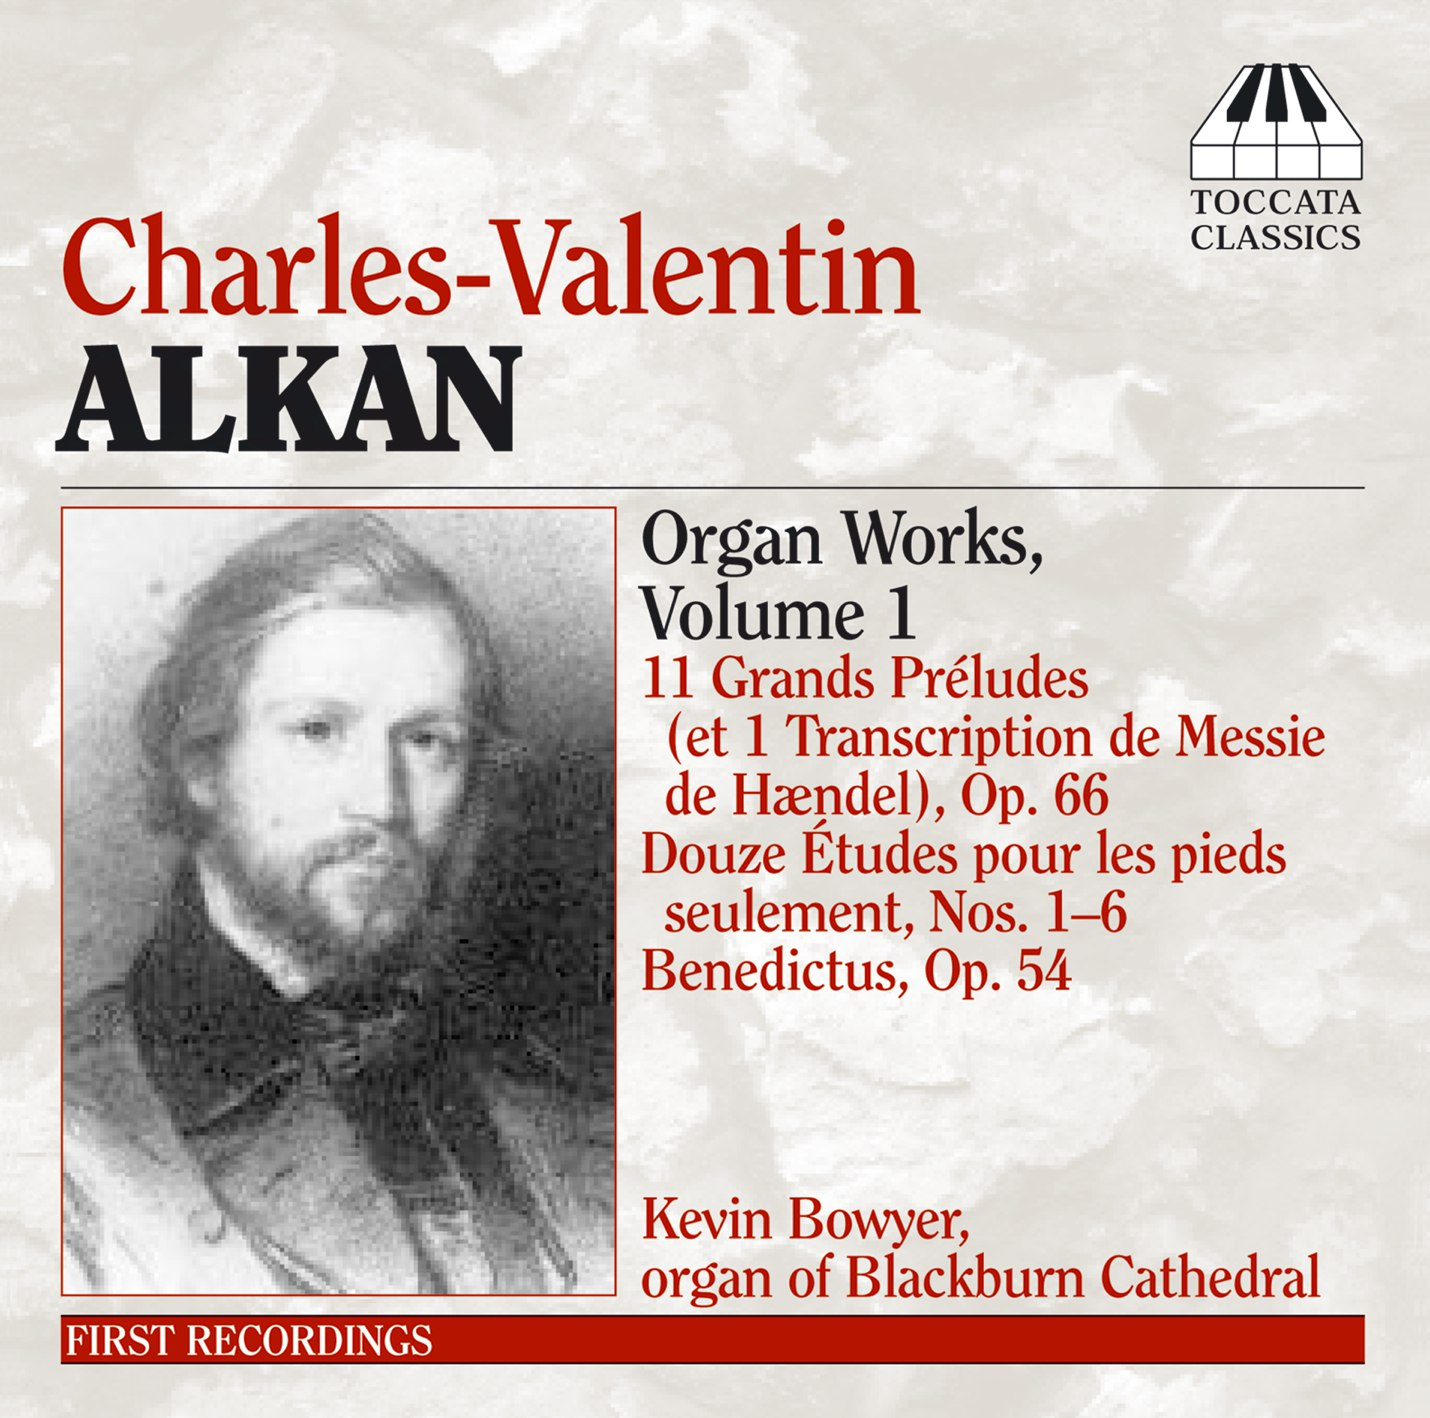 Charles-Valentin Alkan: Organ Works